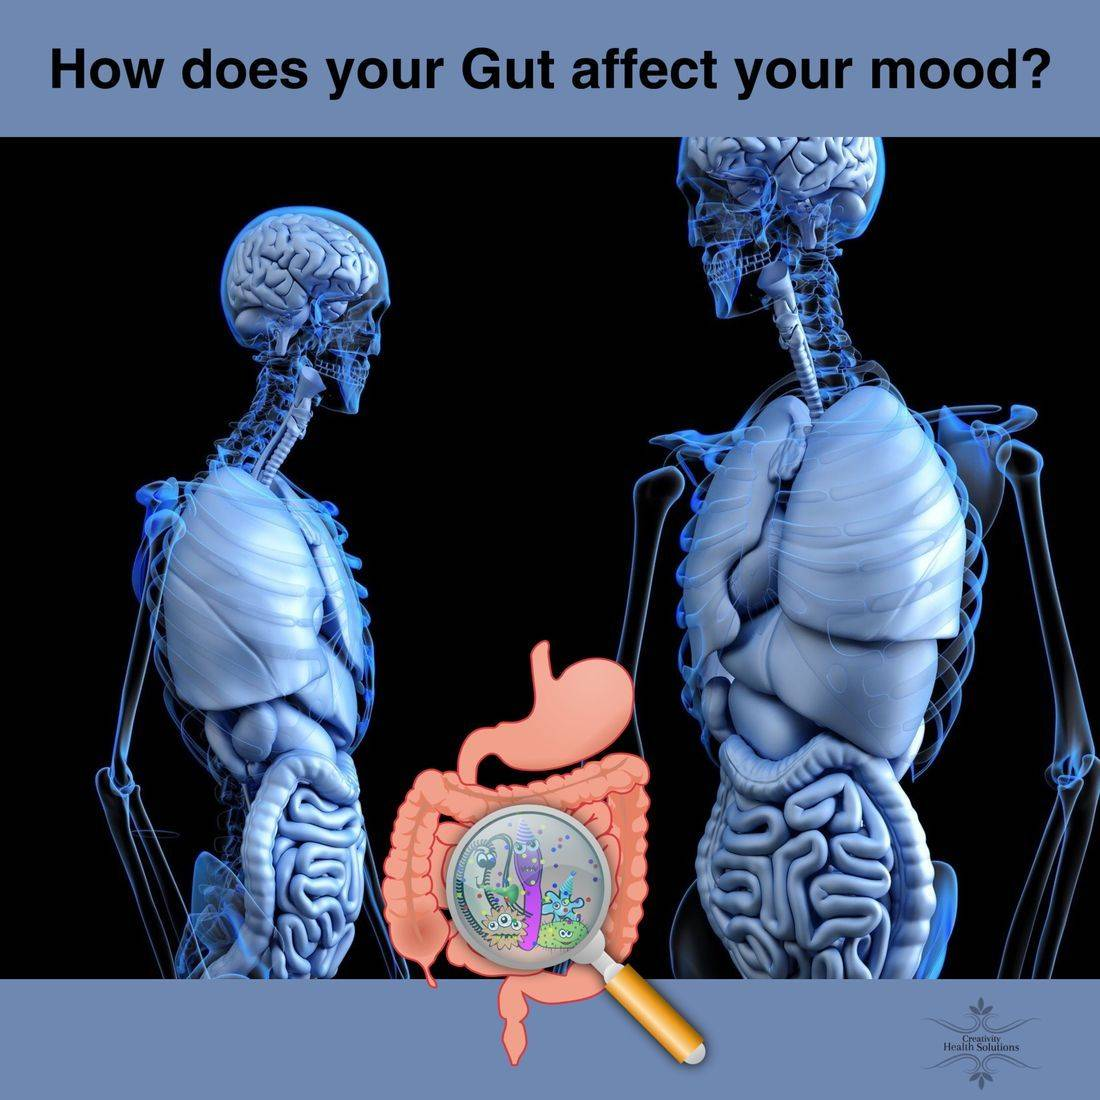 Gut health, gut-brain connection, depression, anxiety, wellness